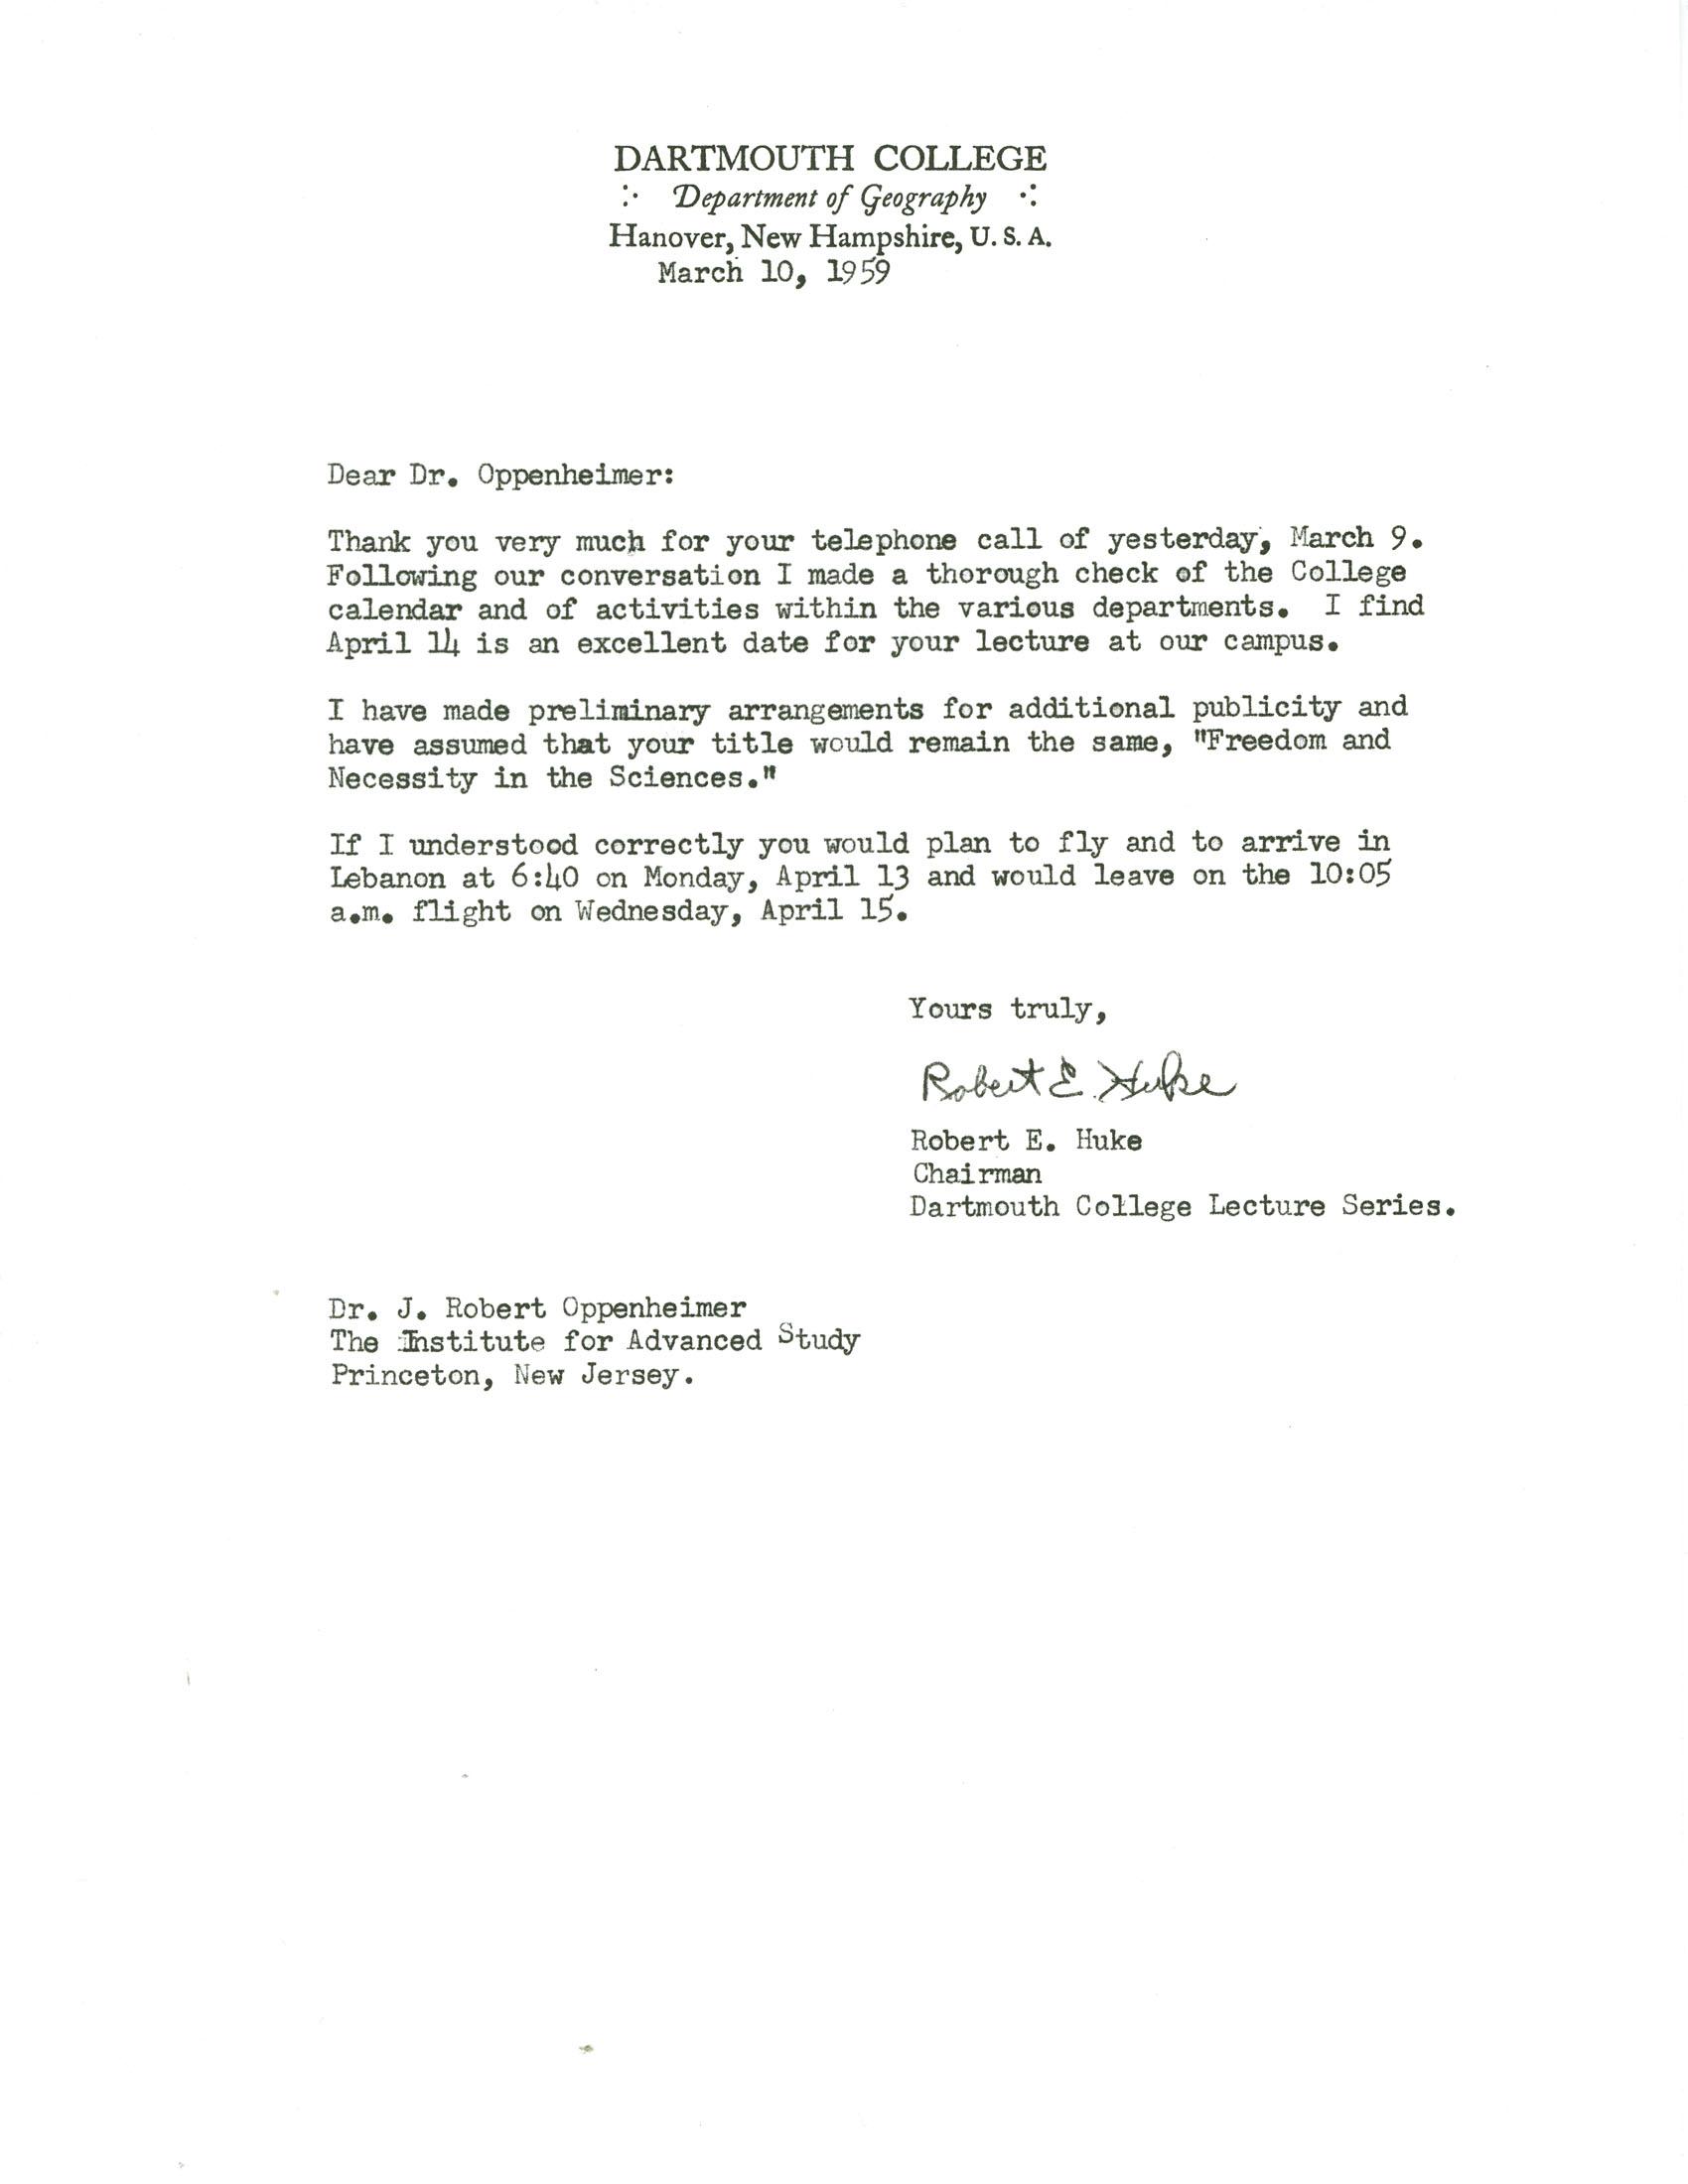 Professional Resume  Cover Letter  LinkedIn Optimization Kijiji